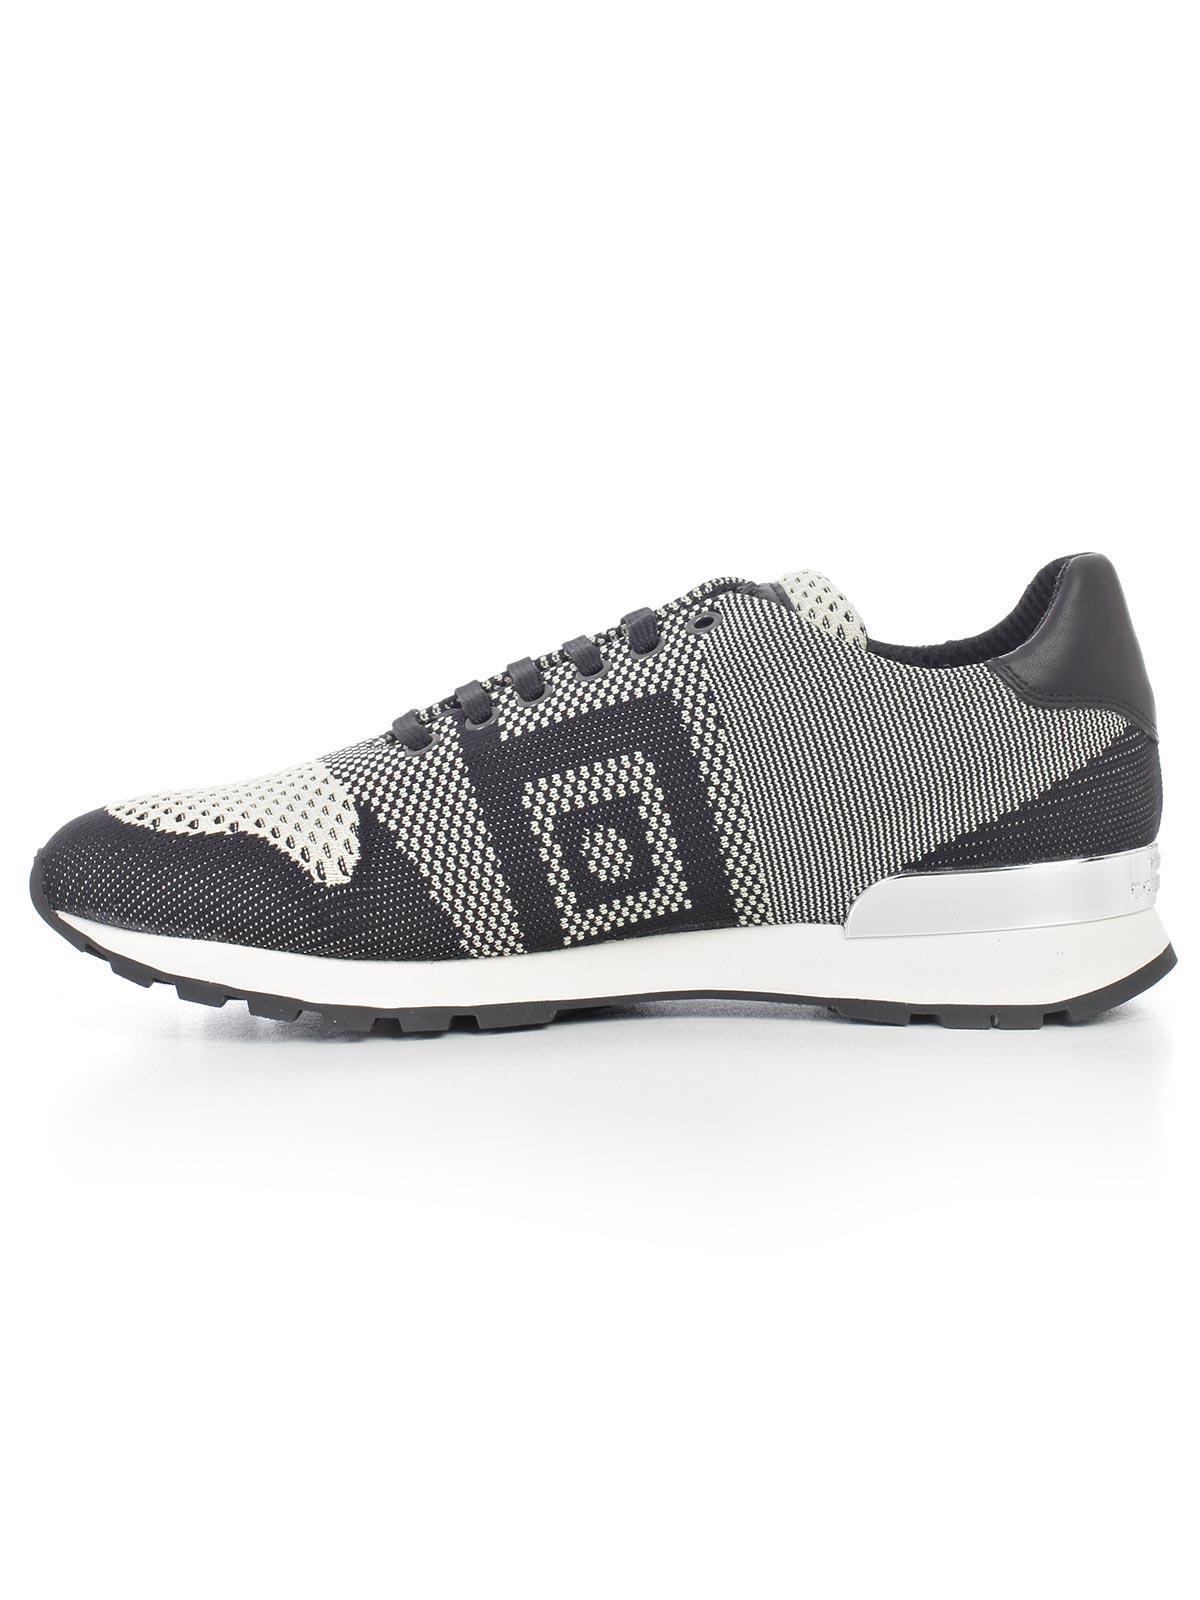 4da21389c Lyst - Versace Scarpa Sneakers in Black for Men